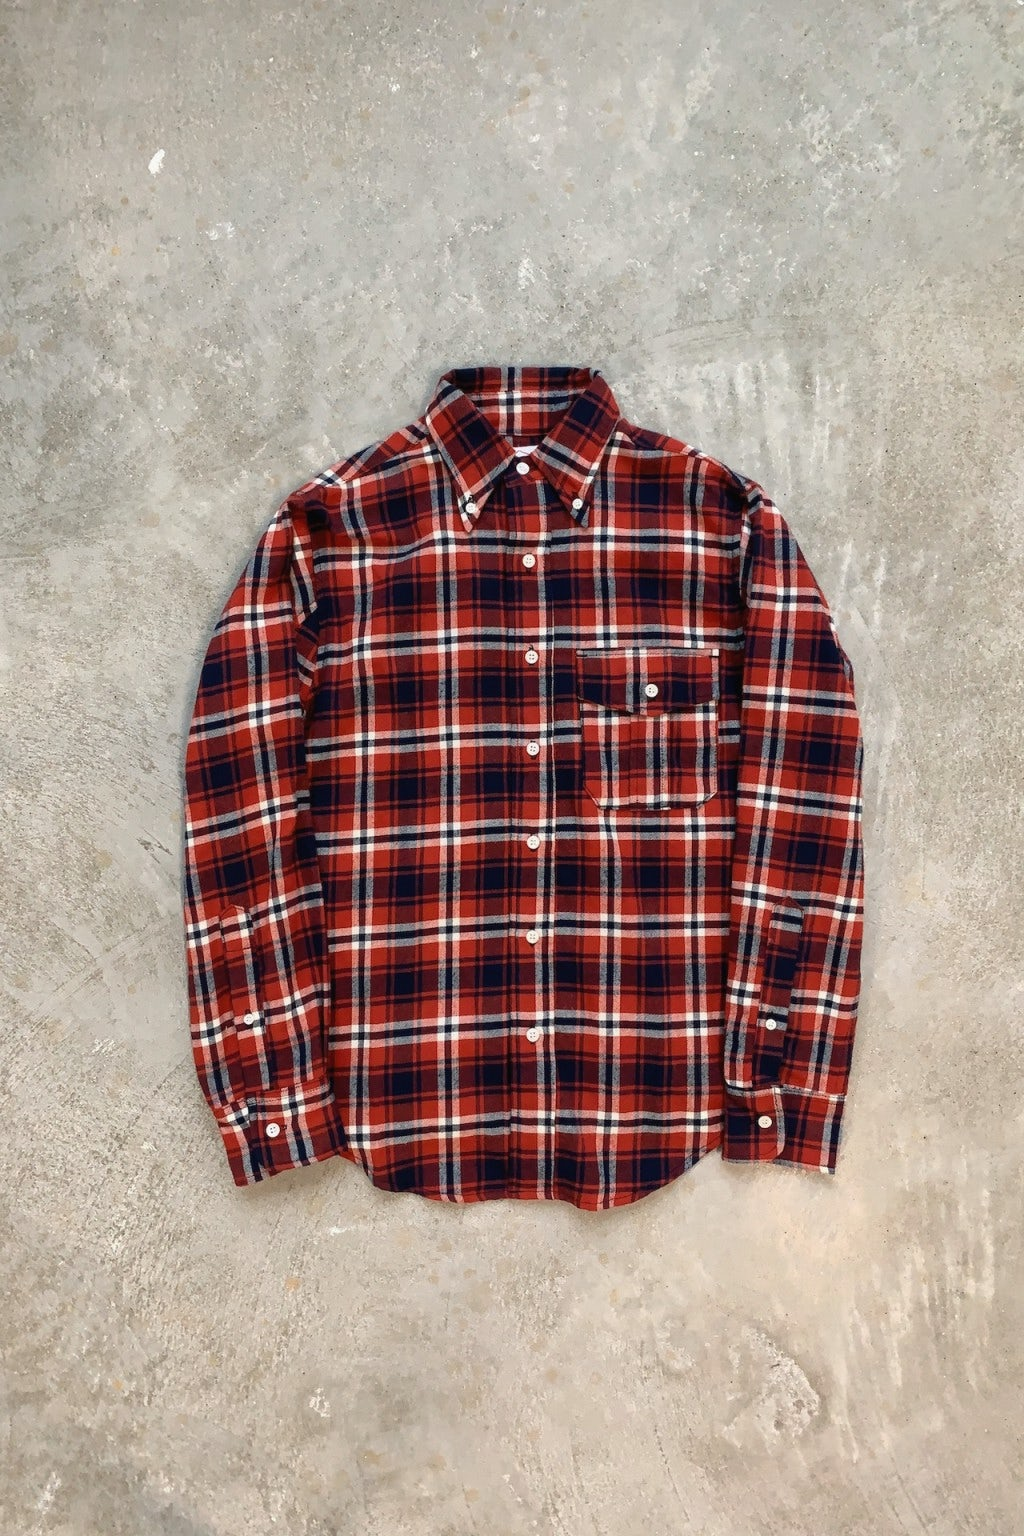 Battenwear BD Scout Shirt Red Plaid